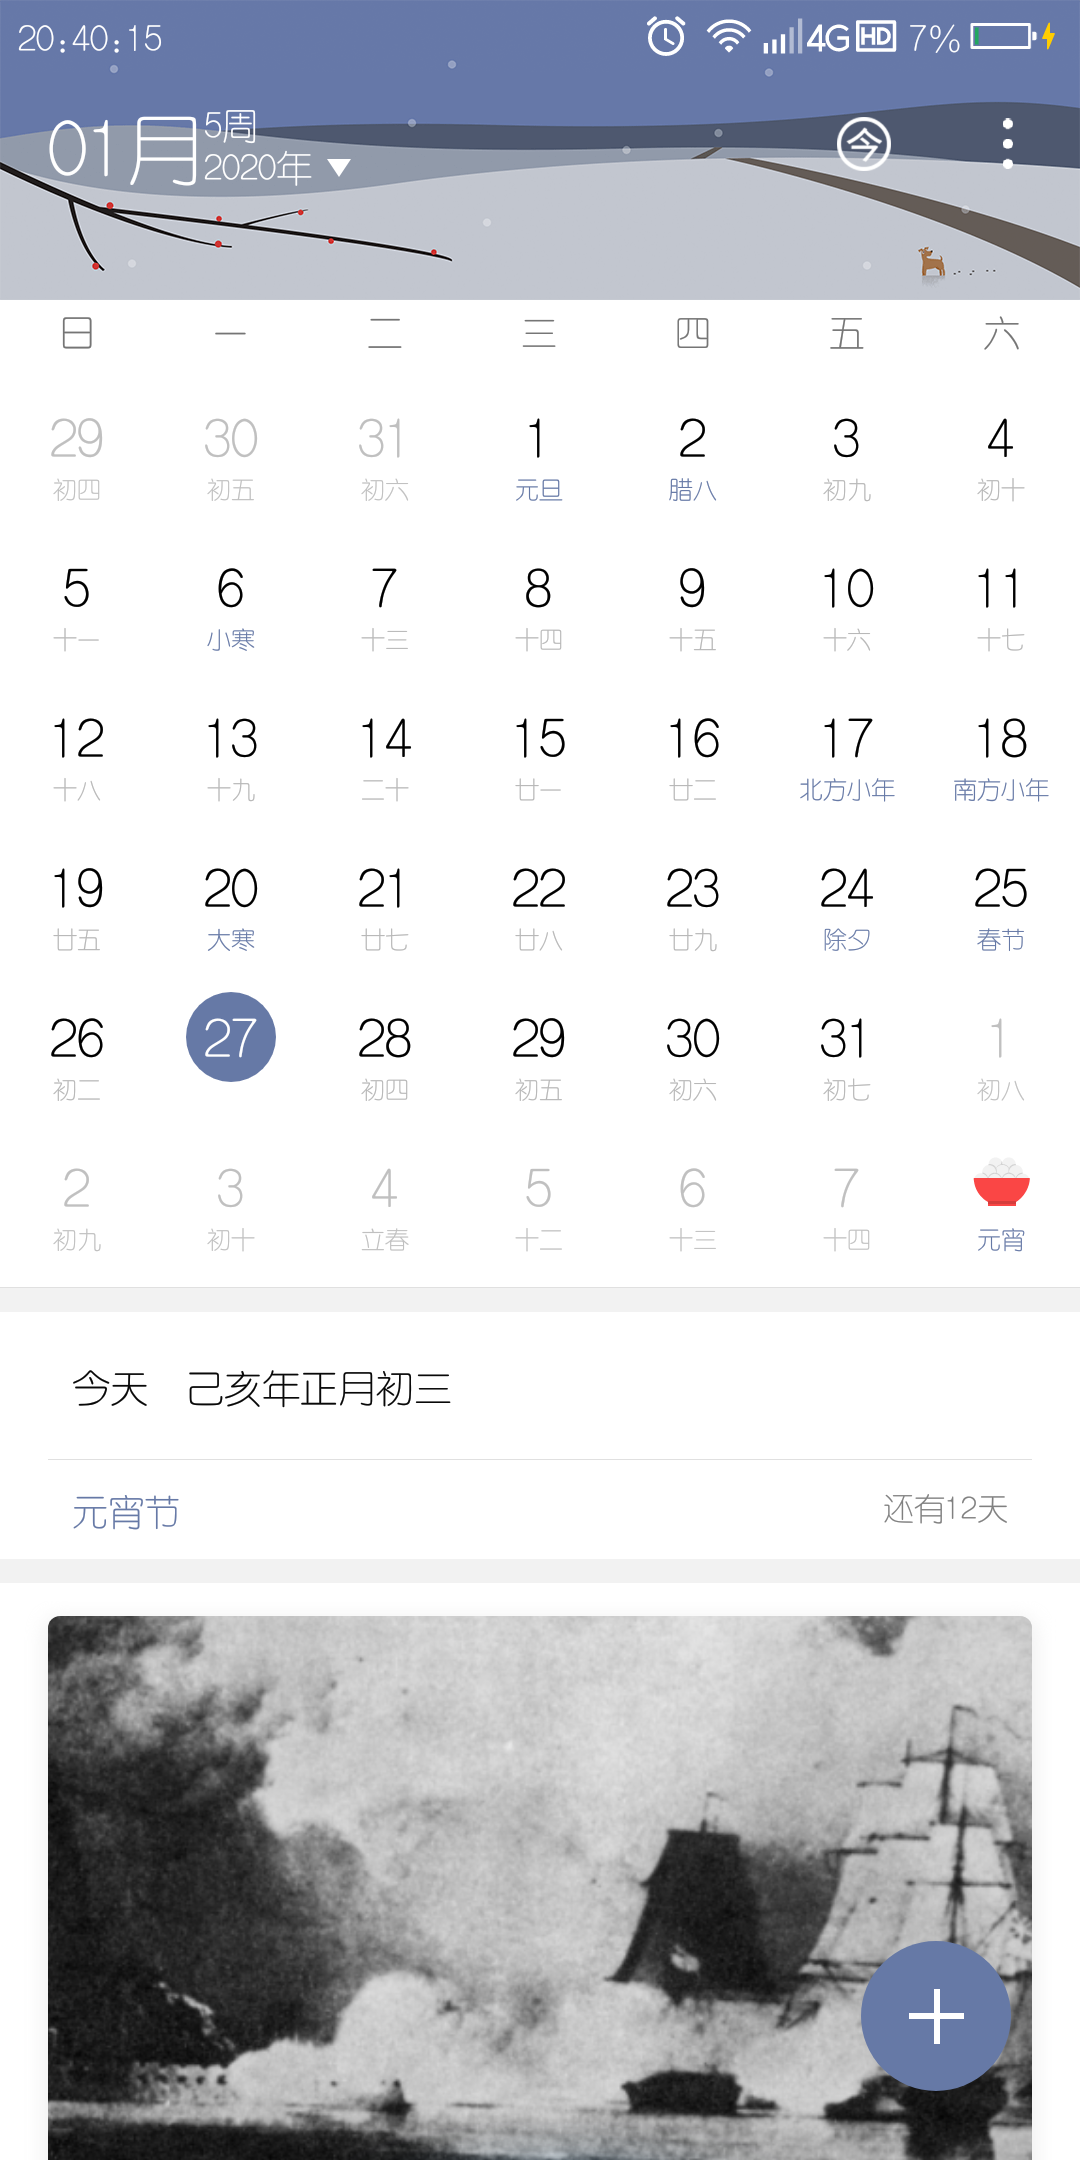 Screenshot_2020-01-27-20-40-17.png